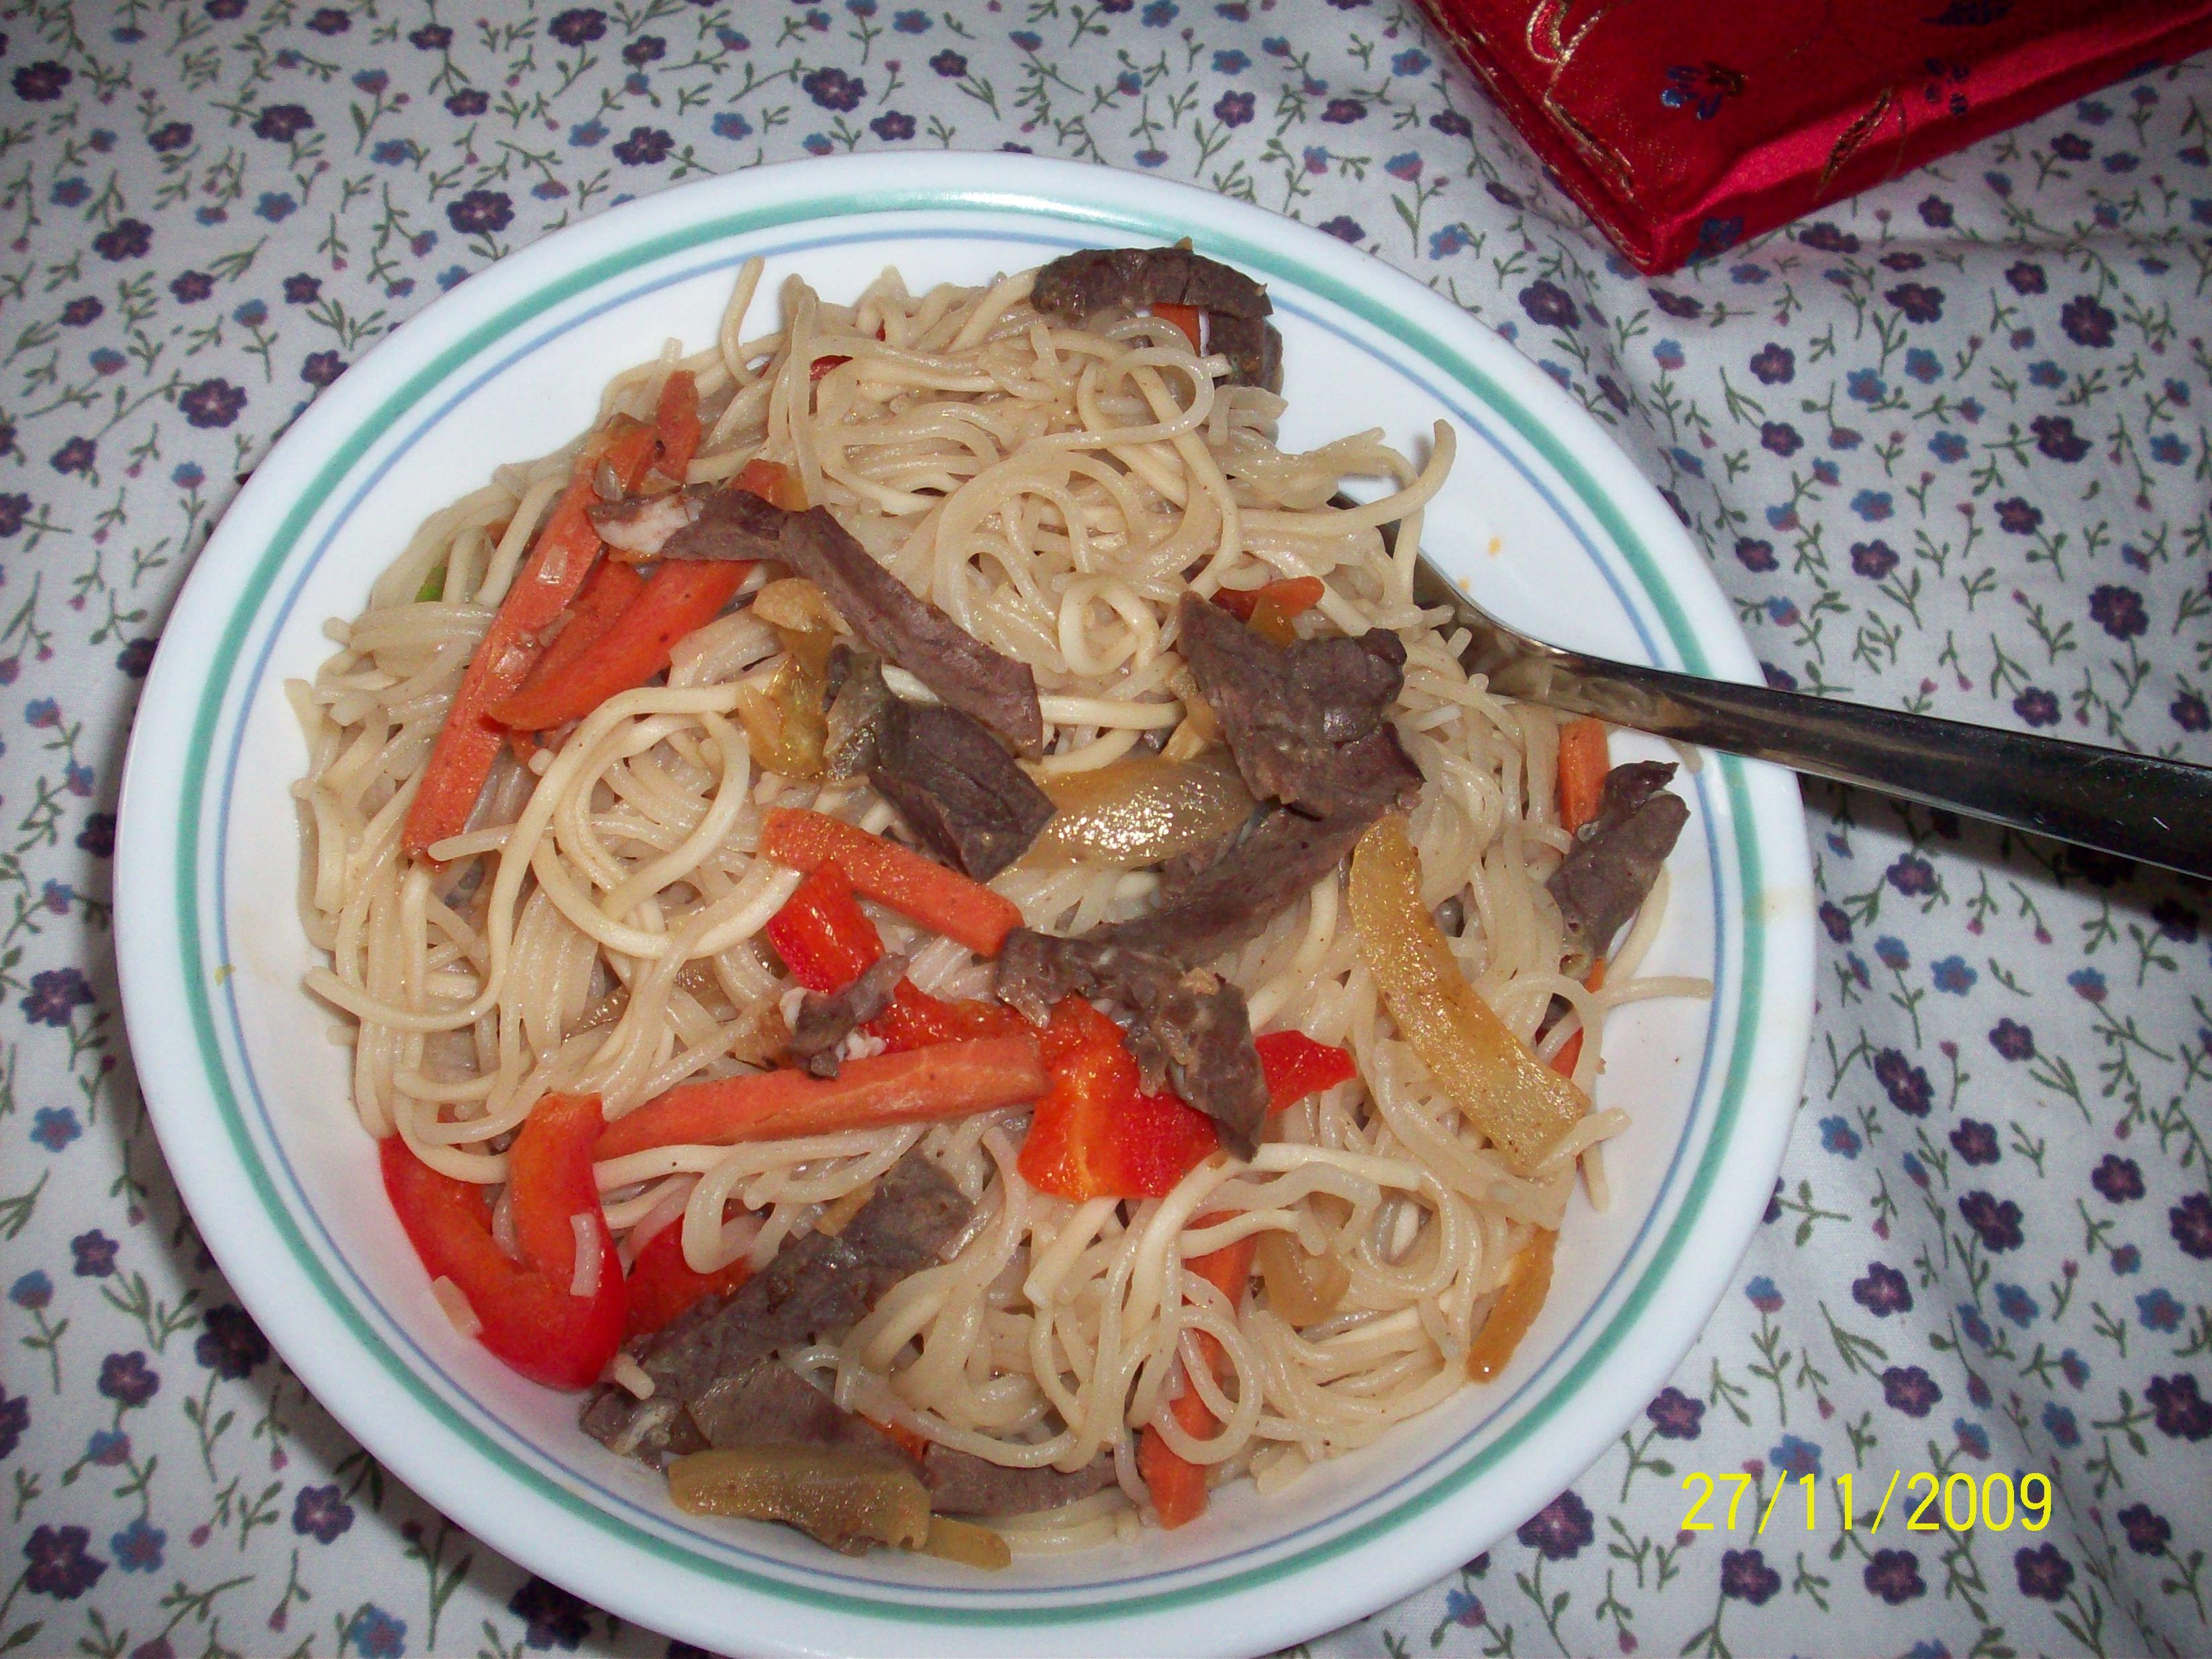 https://foodloader.net/cutie_2009-11-27_Stir-Fry_Noodles.jpg